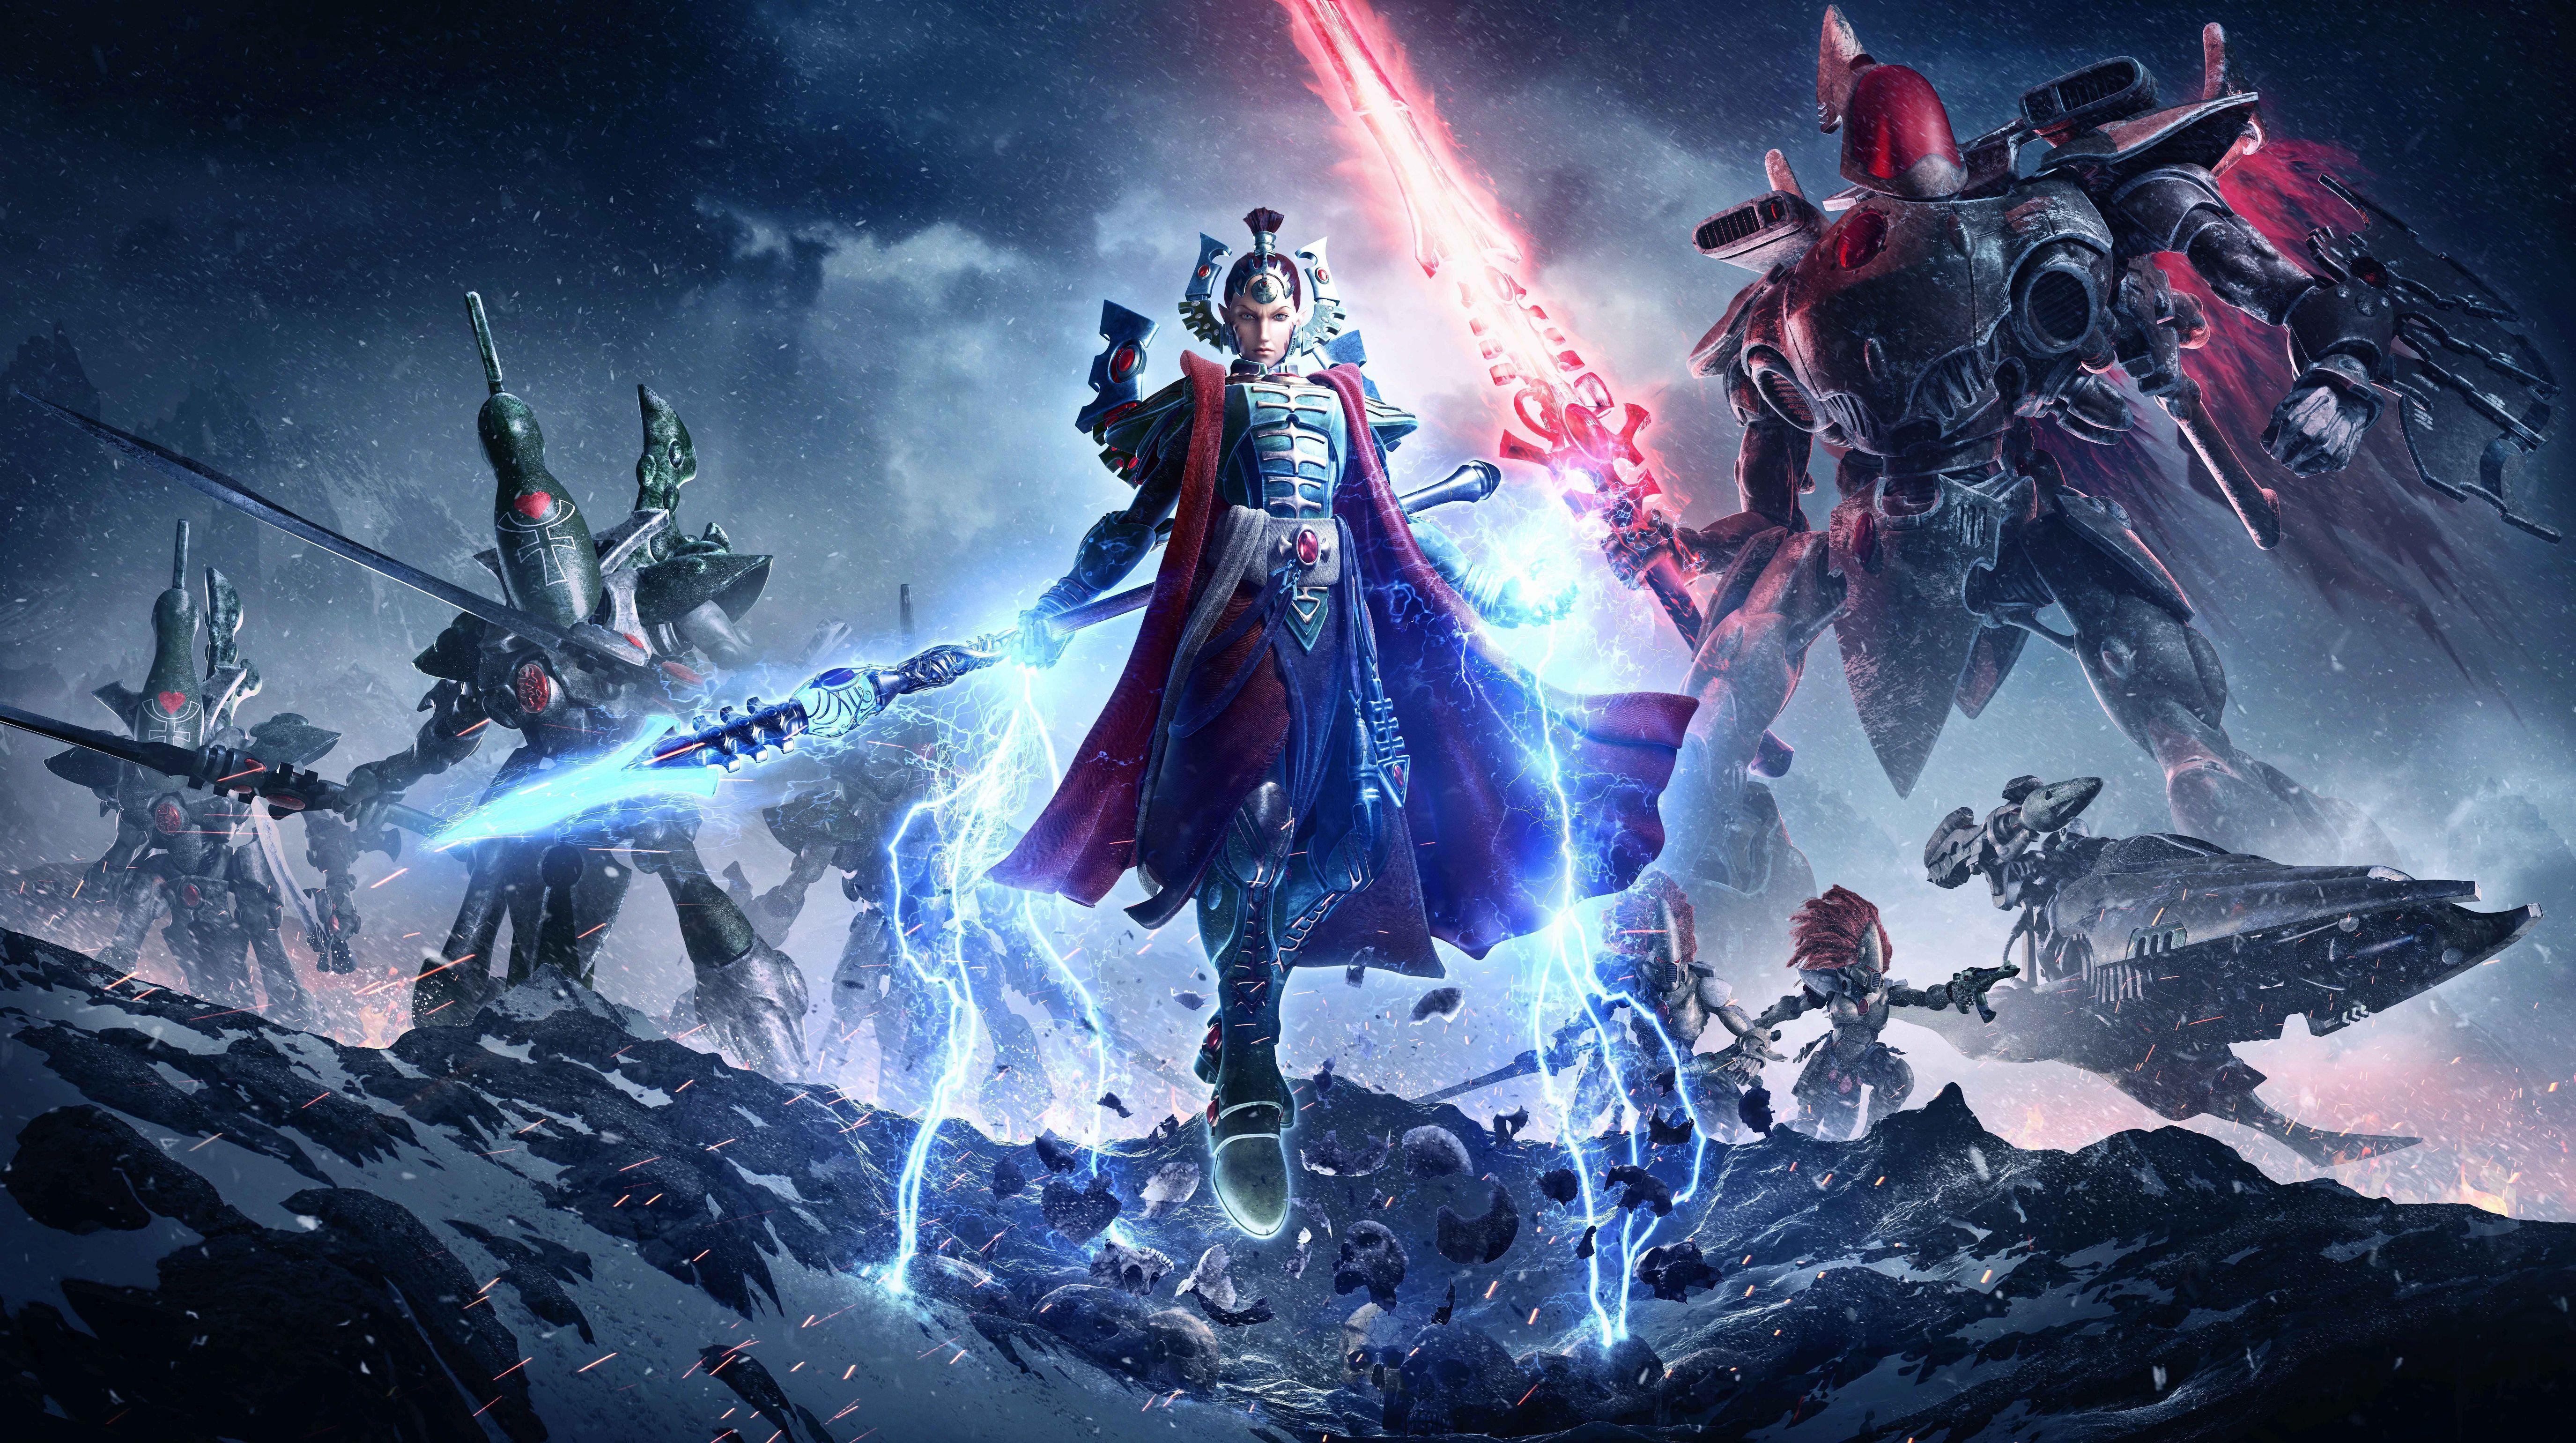 Warhammer 40,000 Dawn Of War III HD Desktop